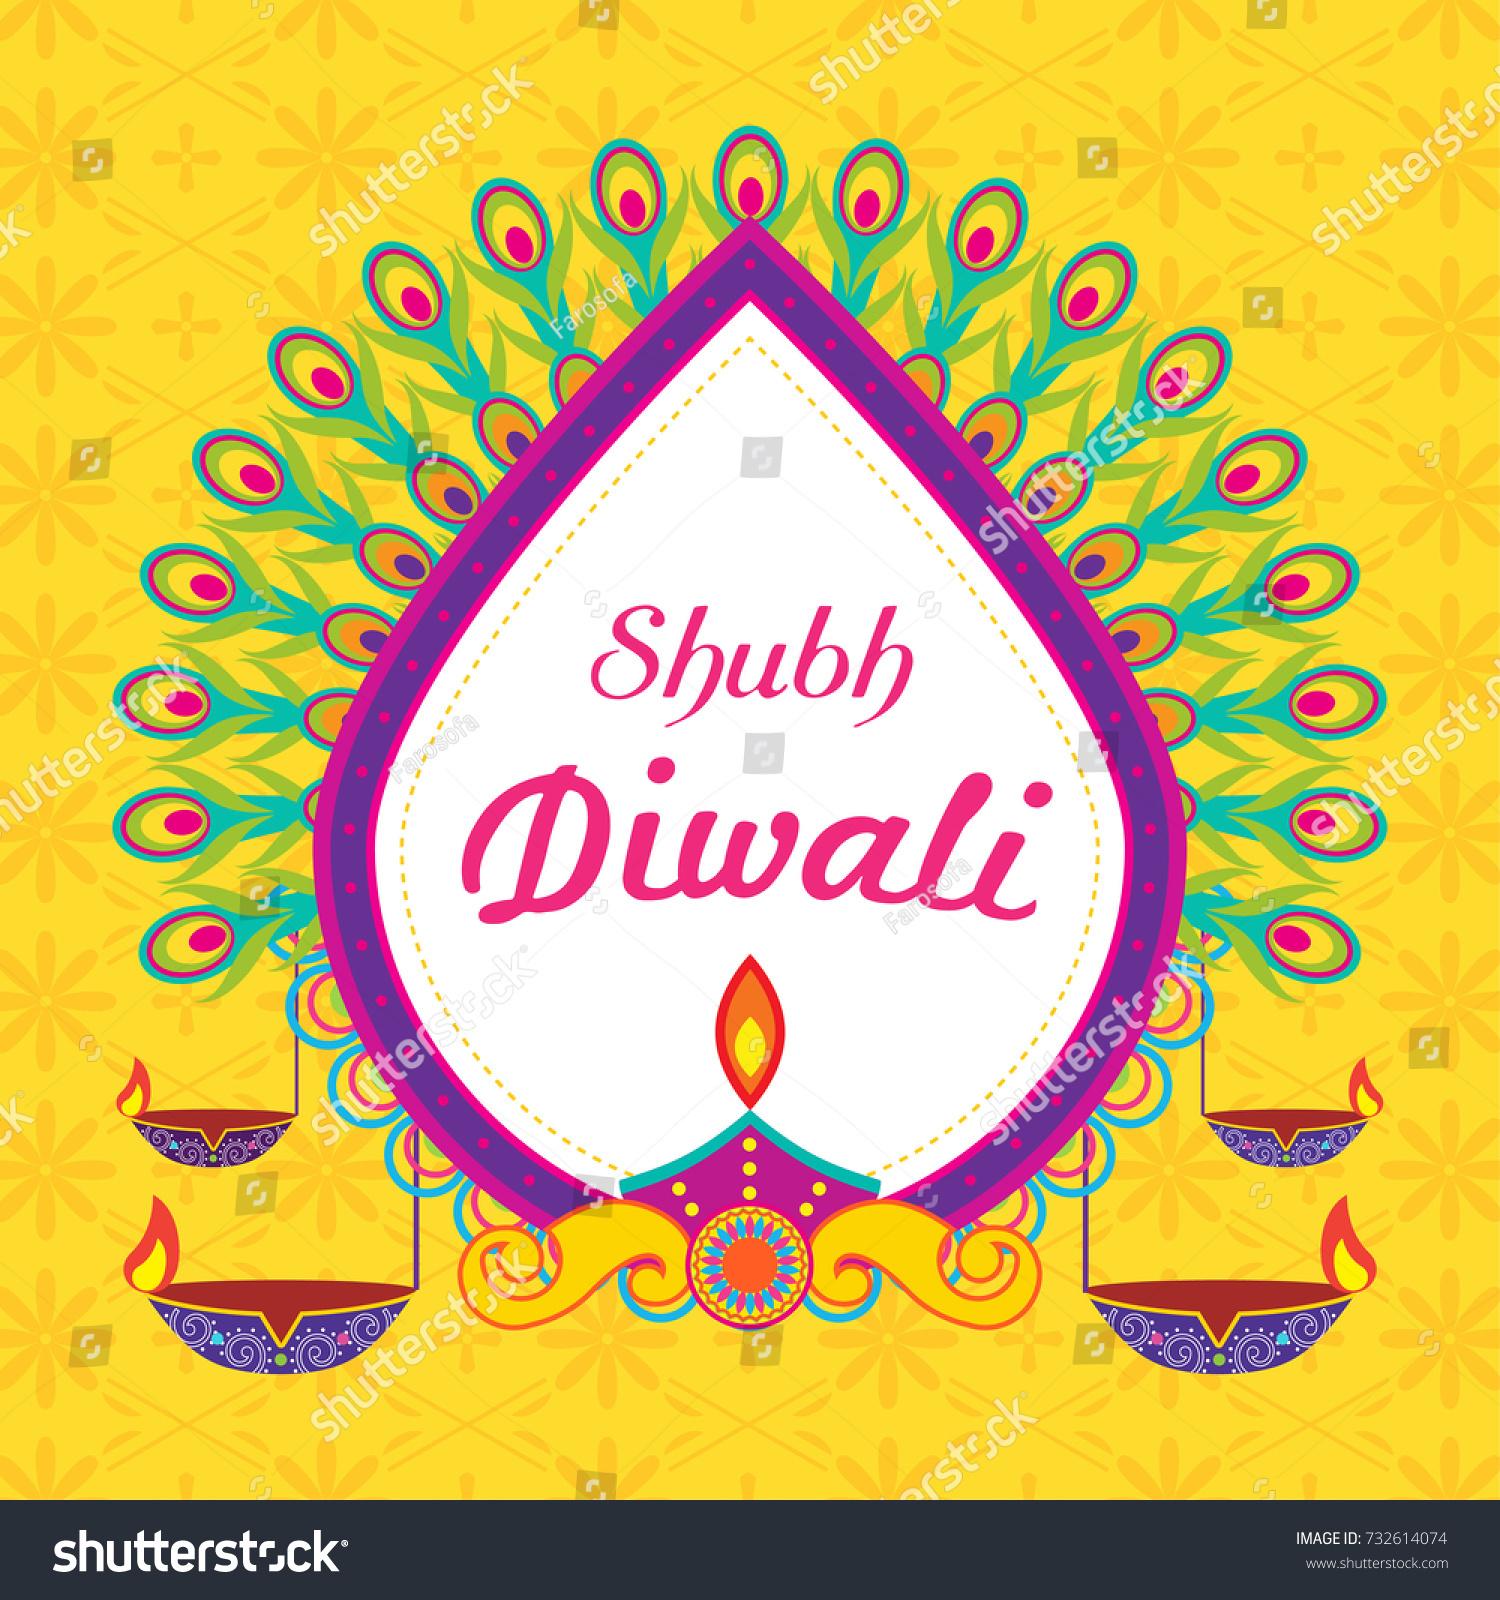 Shubh Diwali Happy Diwali Greeting Card Stock Vector 732614074